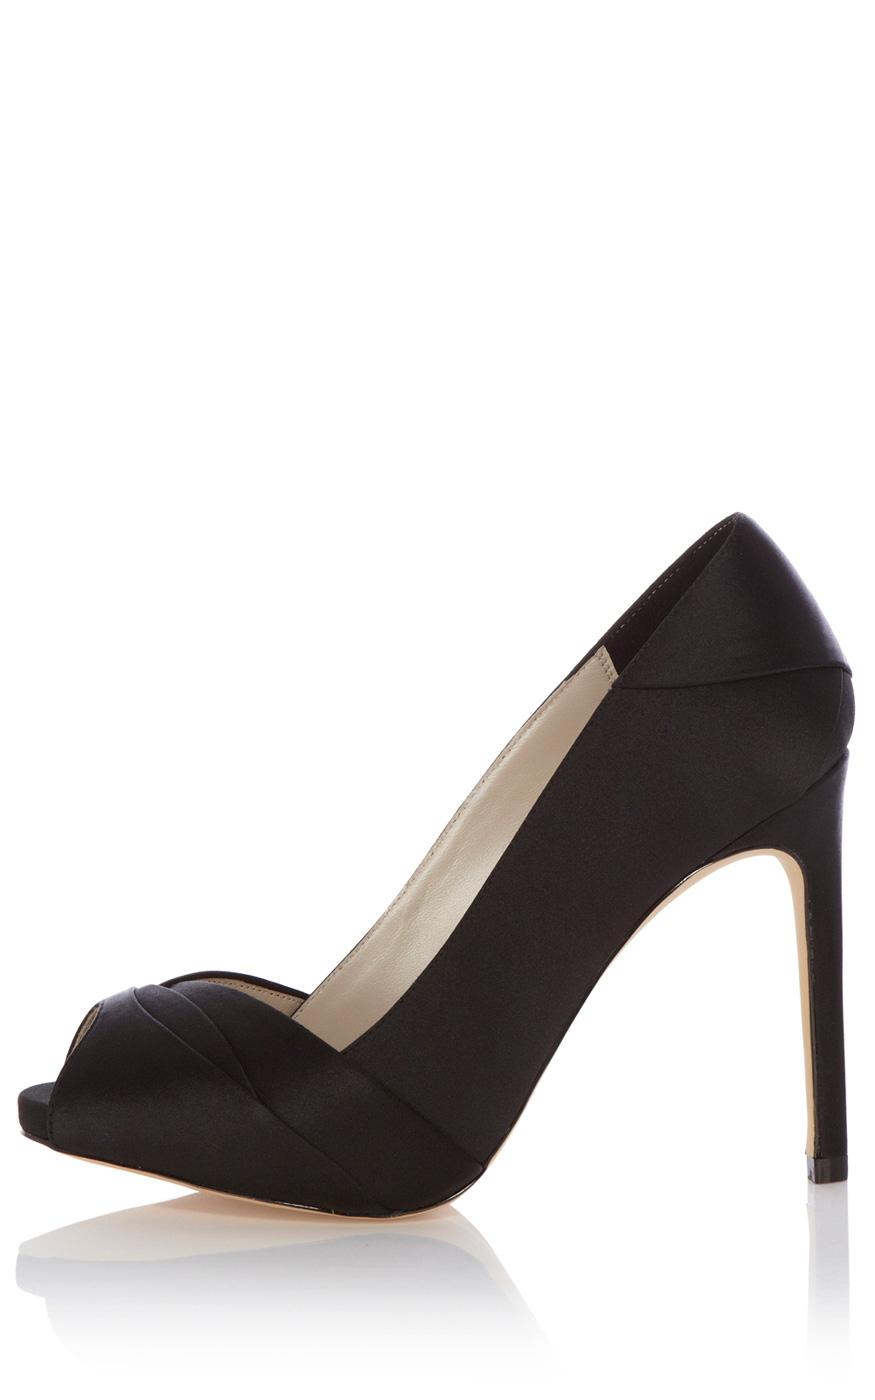 3b74463d1790 Karen Millen Pleated Satin Peep Toe Shoe in Black - Lyst